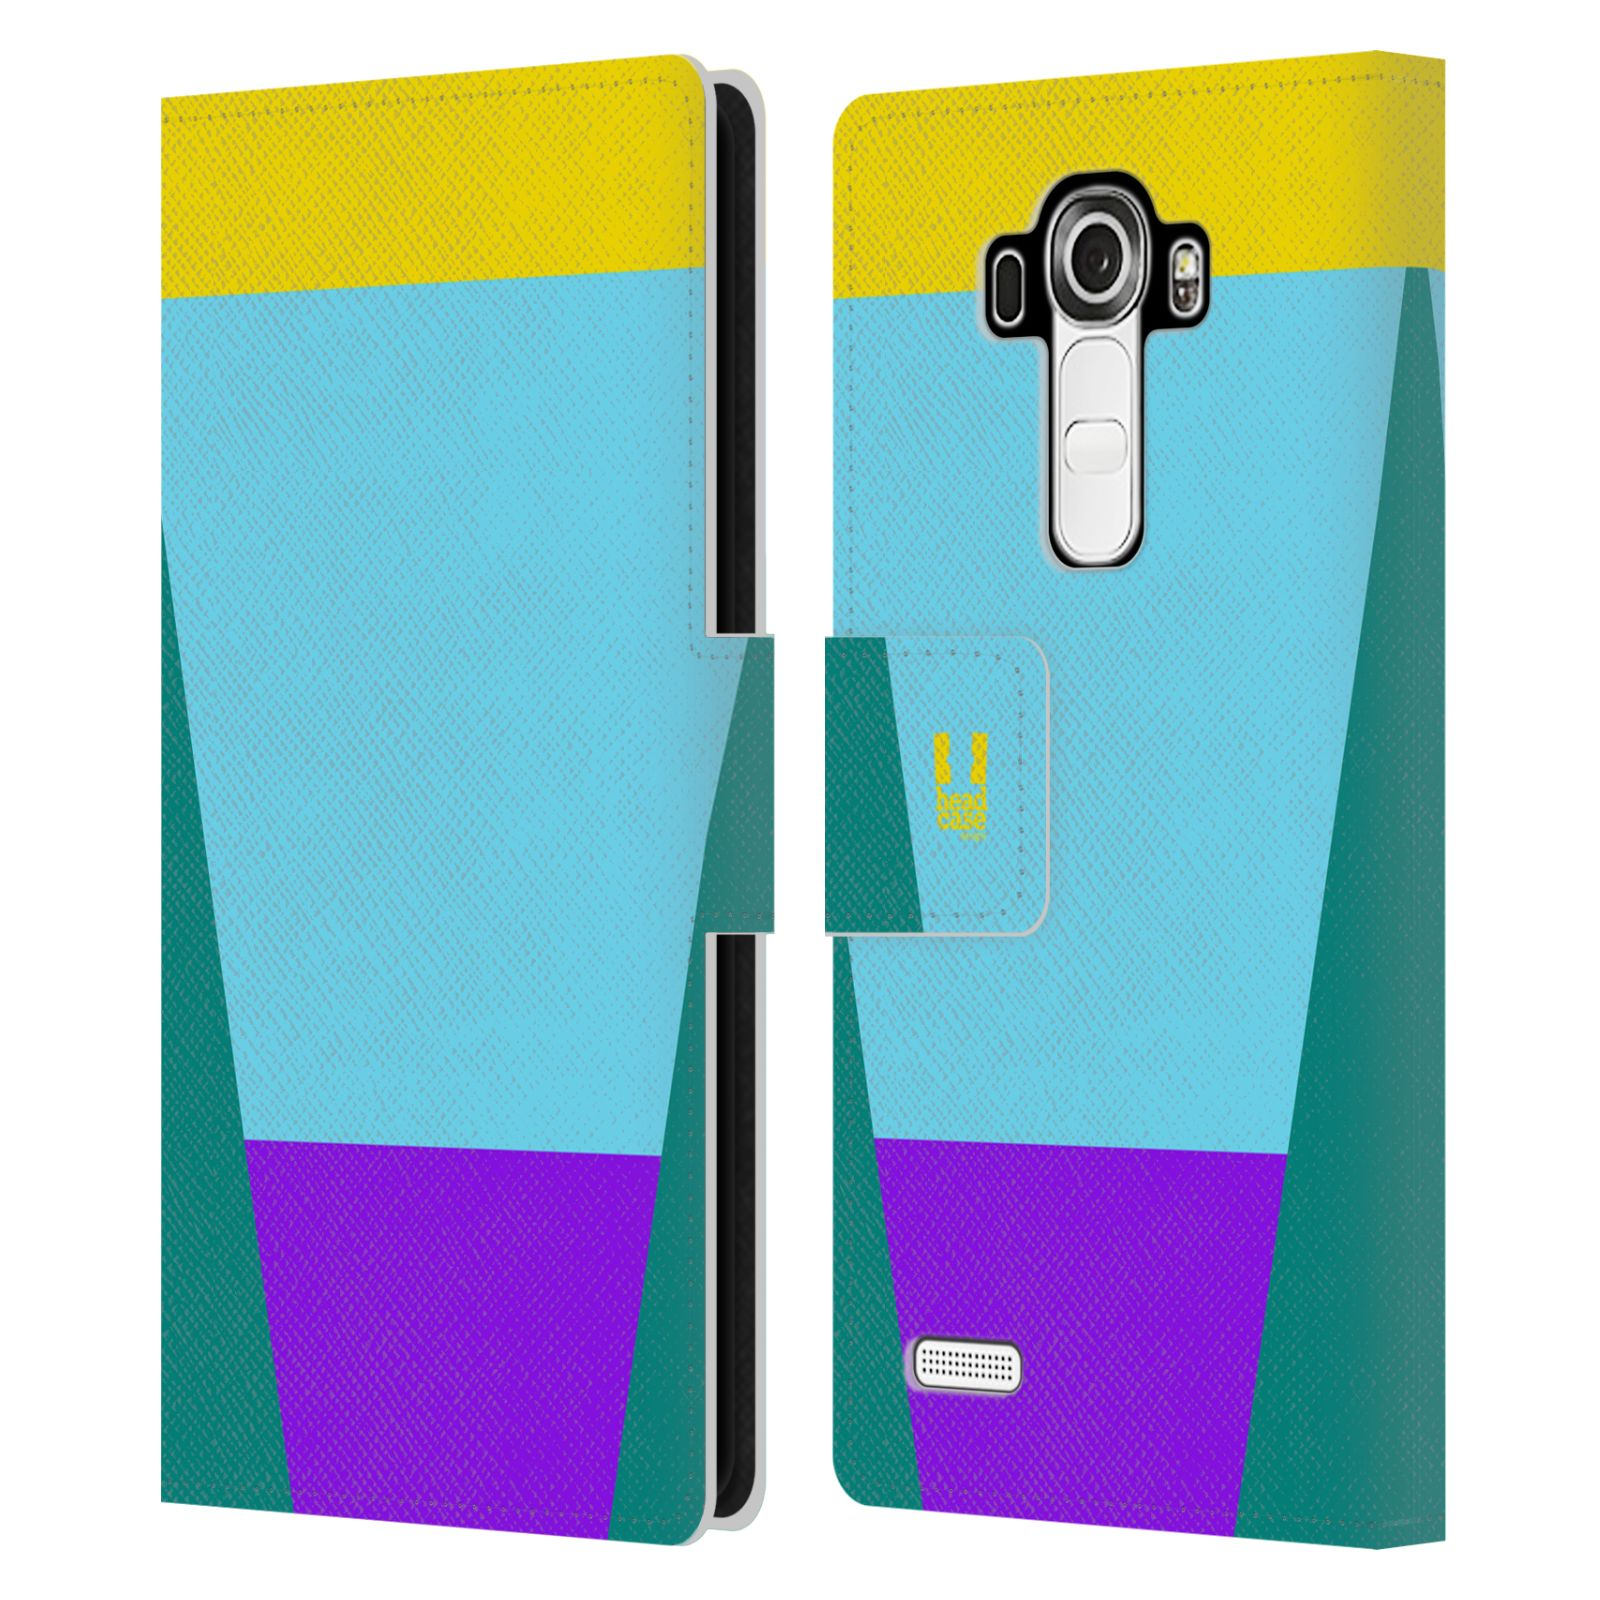 HEAD CASE Flipové pouzdro pro mobil LG G4 barevné tvary nebesky modrá